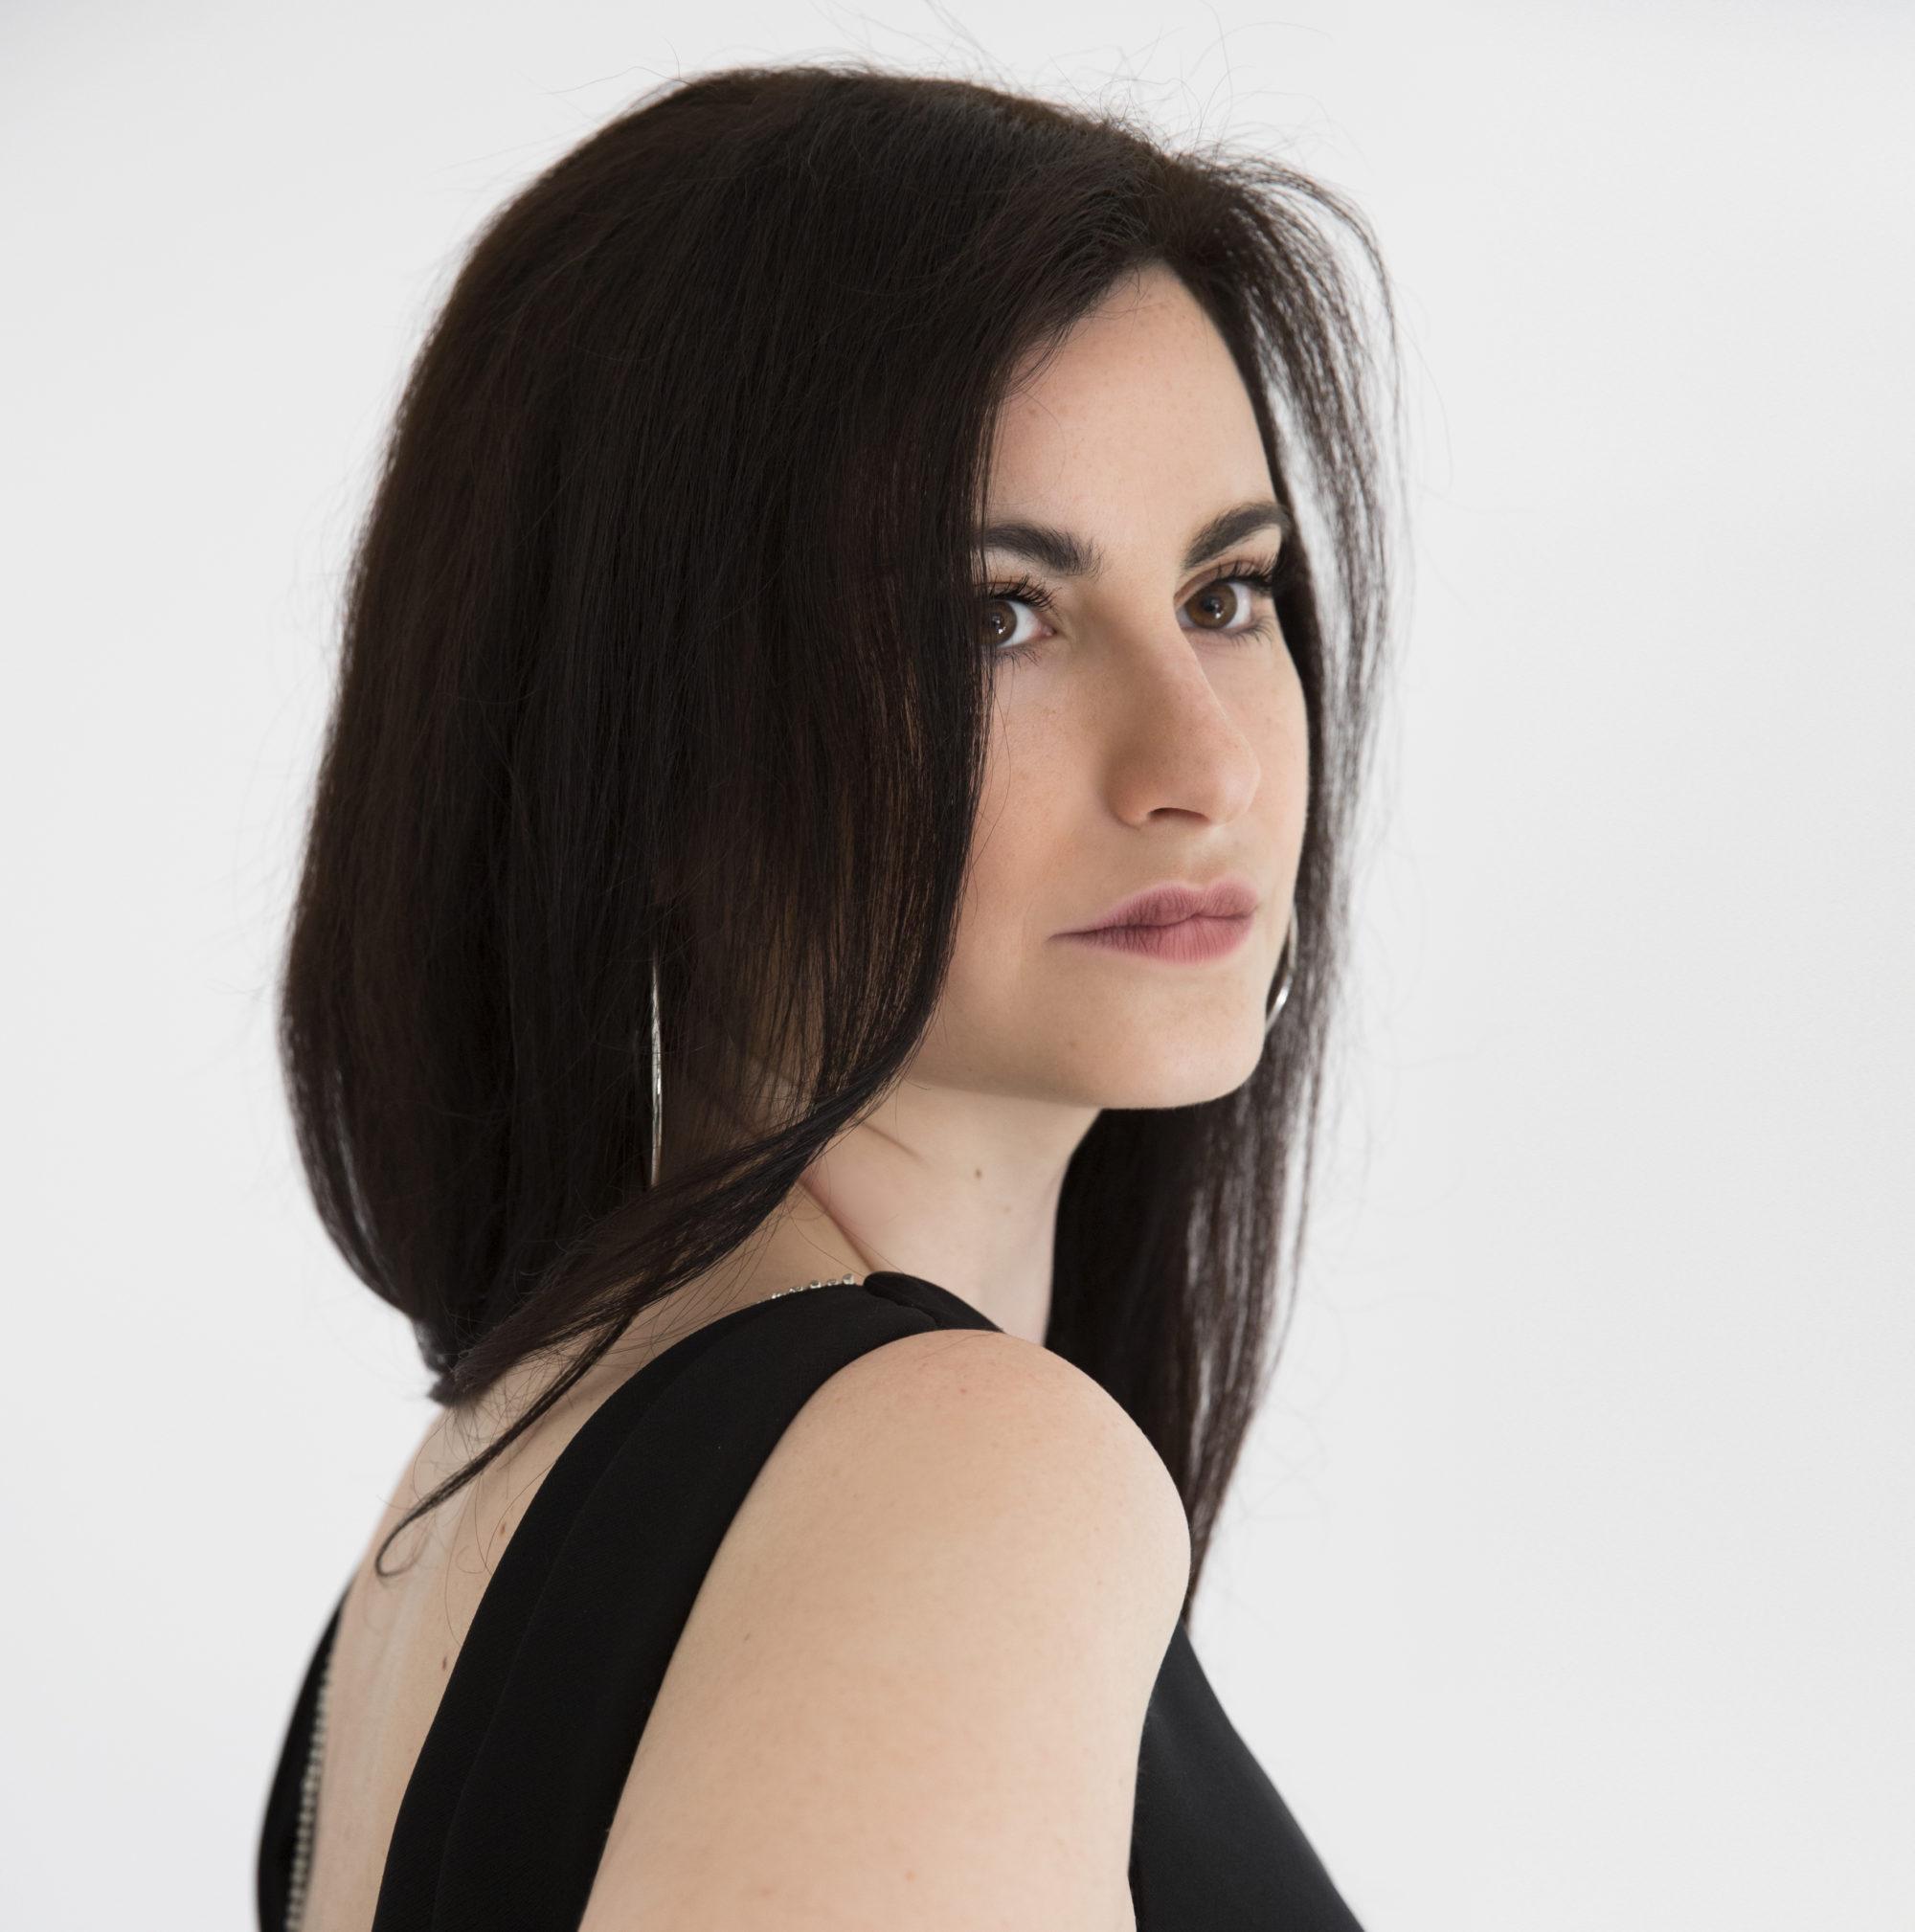 Chiara Galeotti